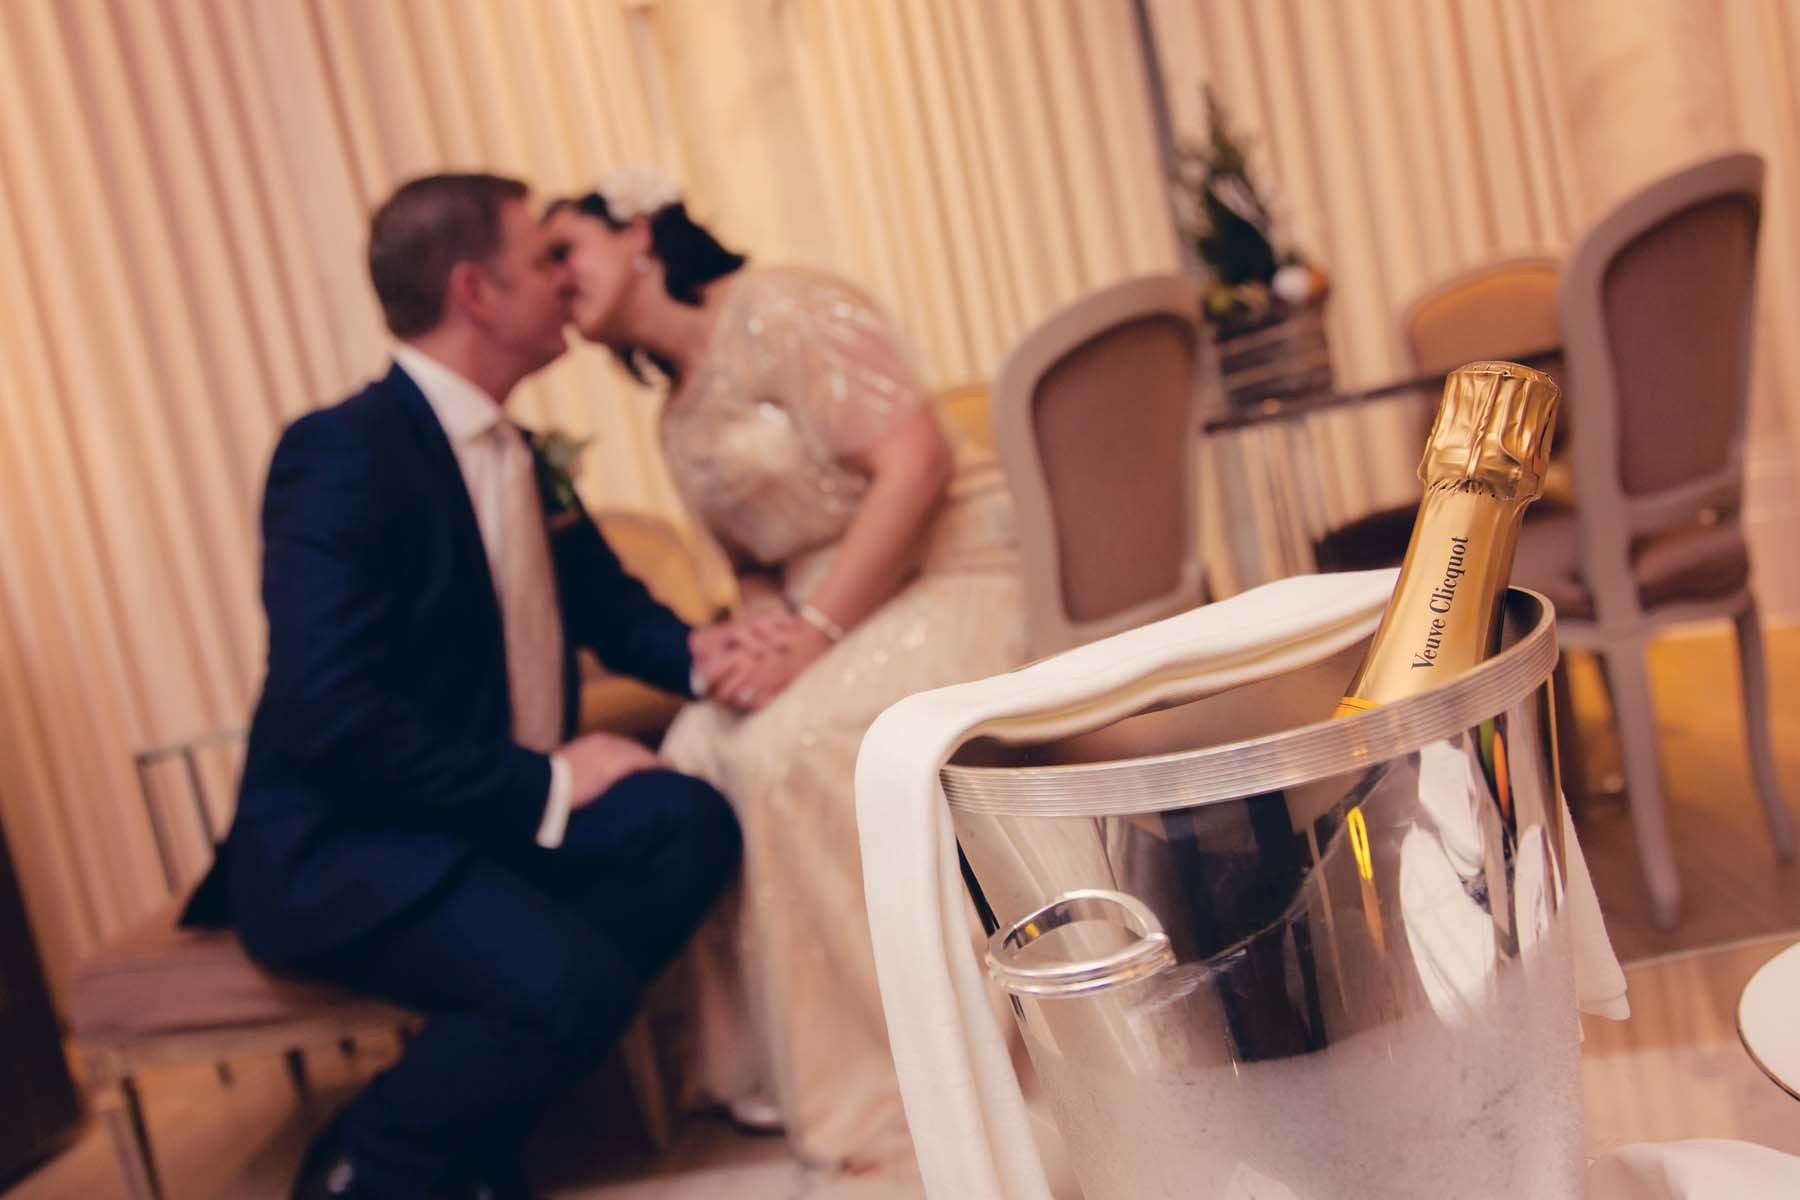 Sussex & Surrey Wedding Photographer - Bride & Groom (39)